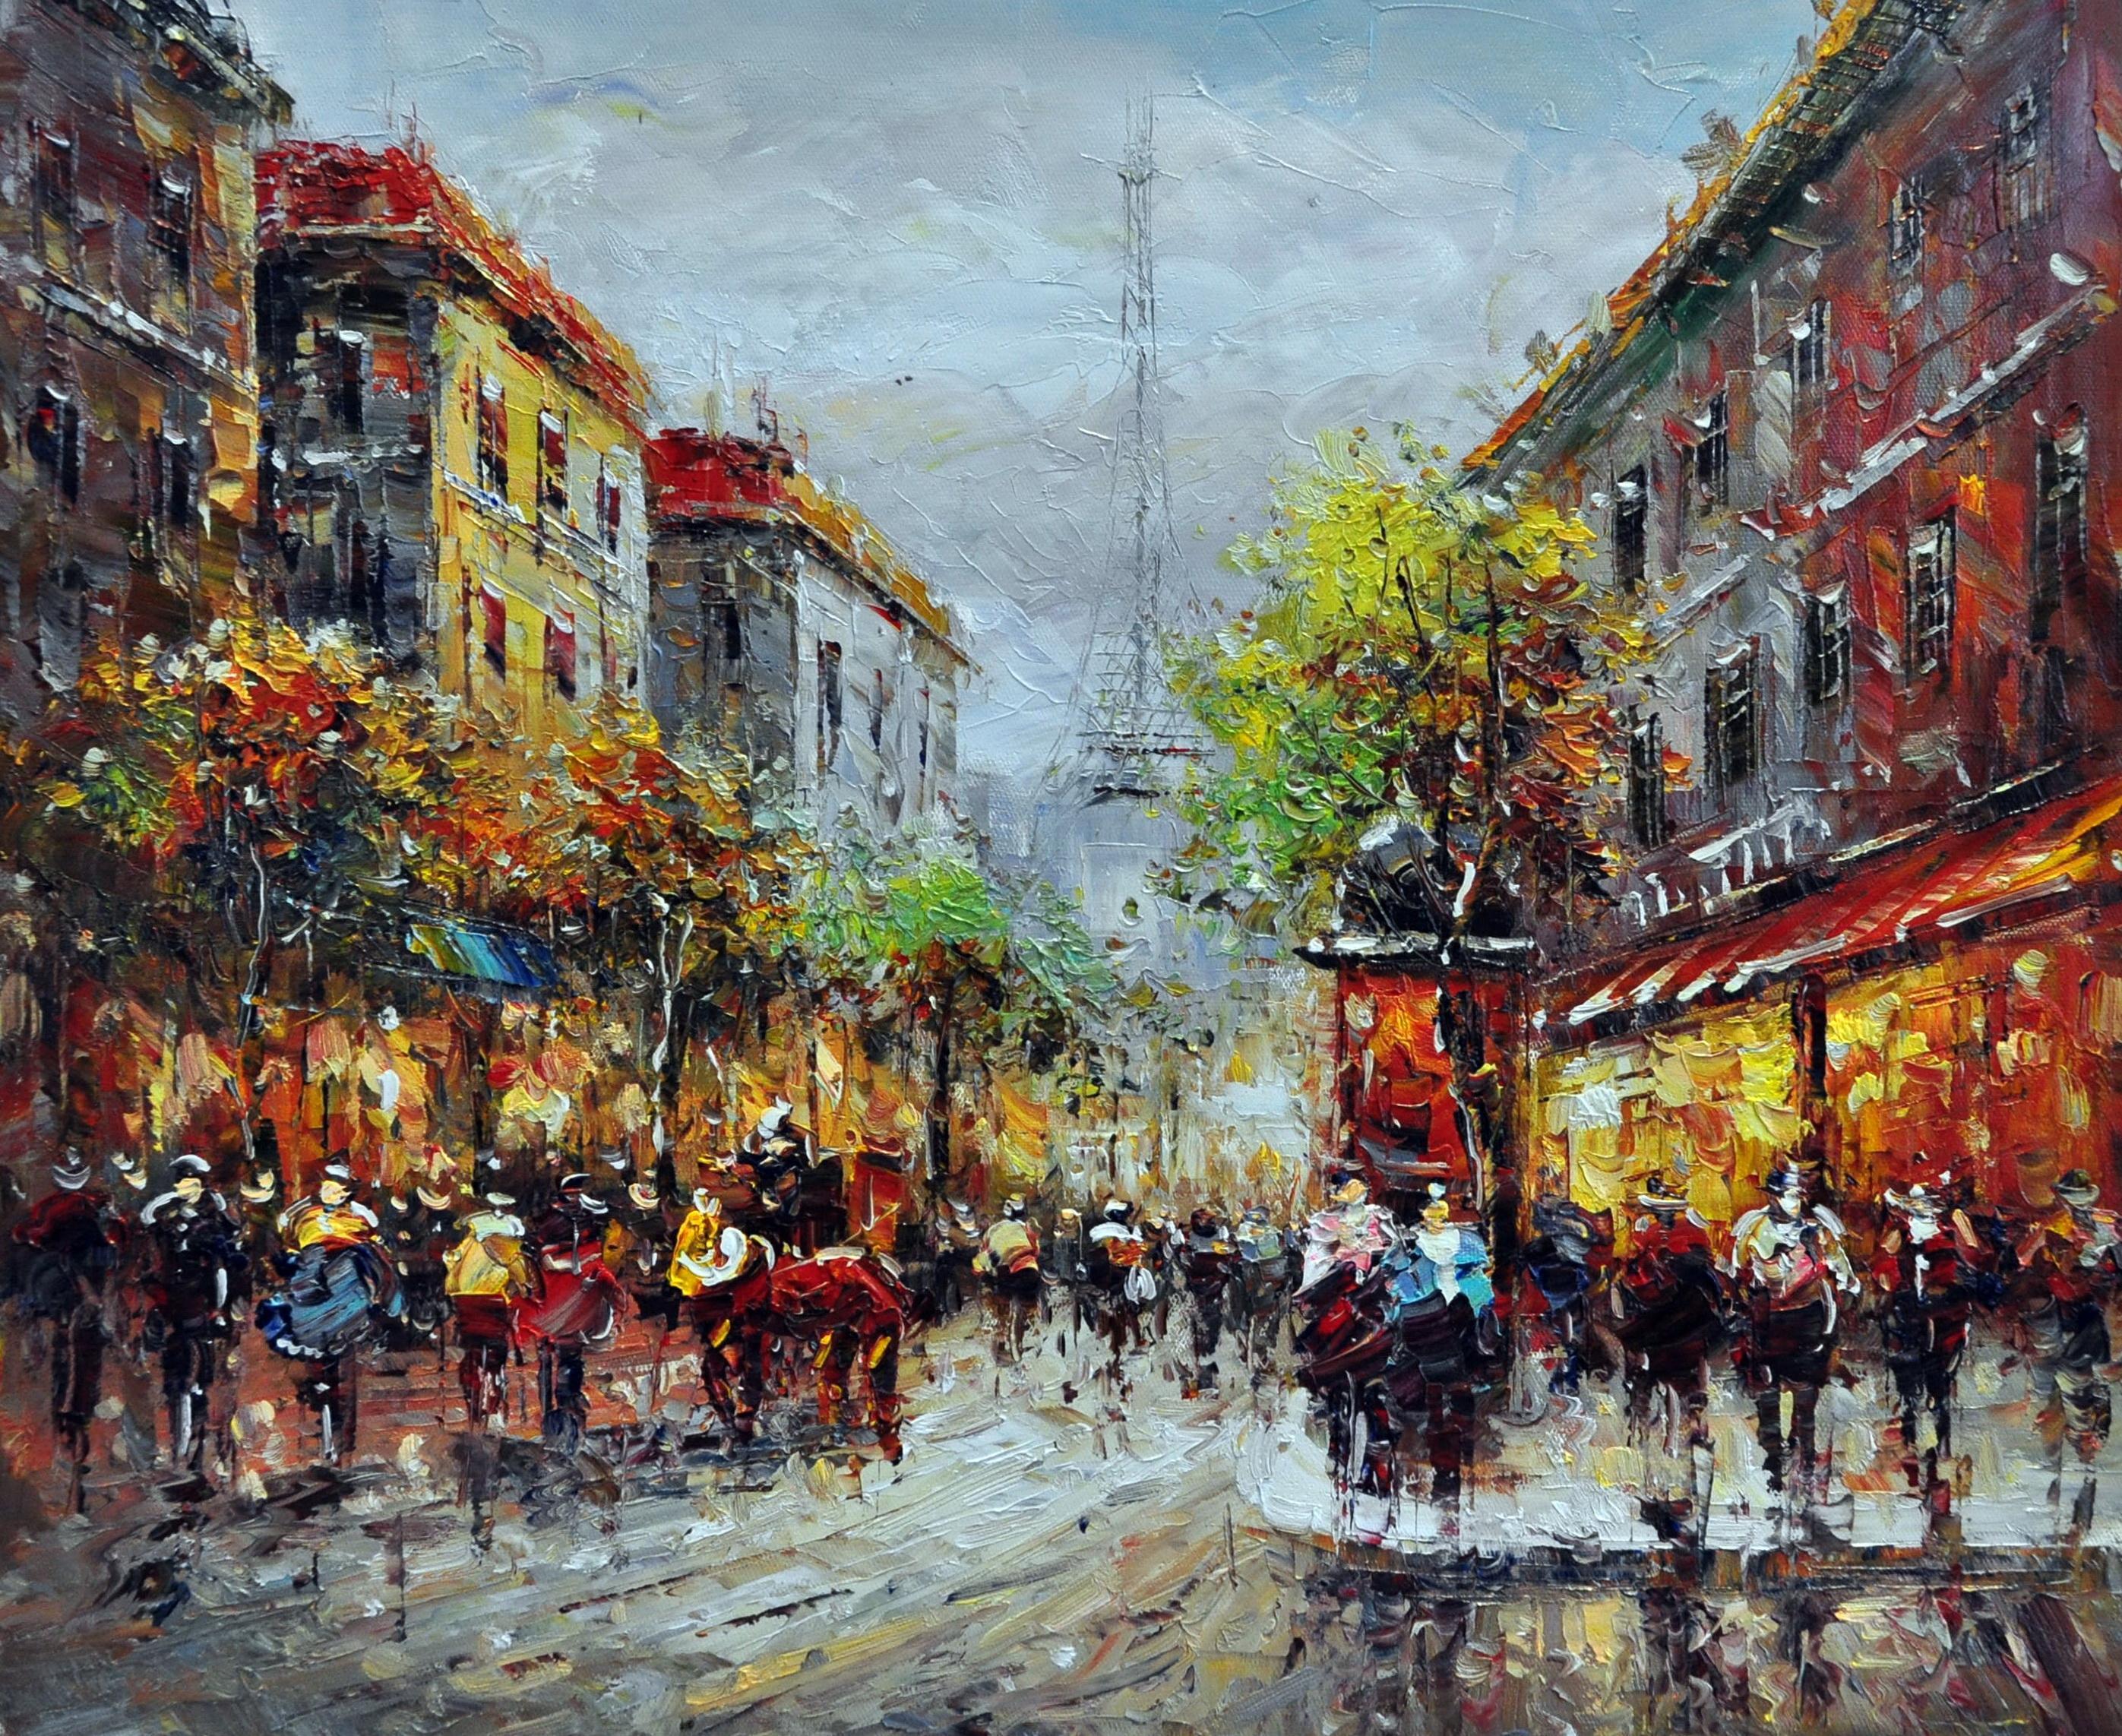 «Городской пейзаж» картина 50х60 арт.5ГР133